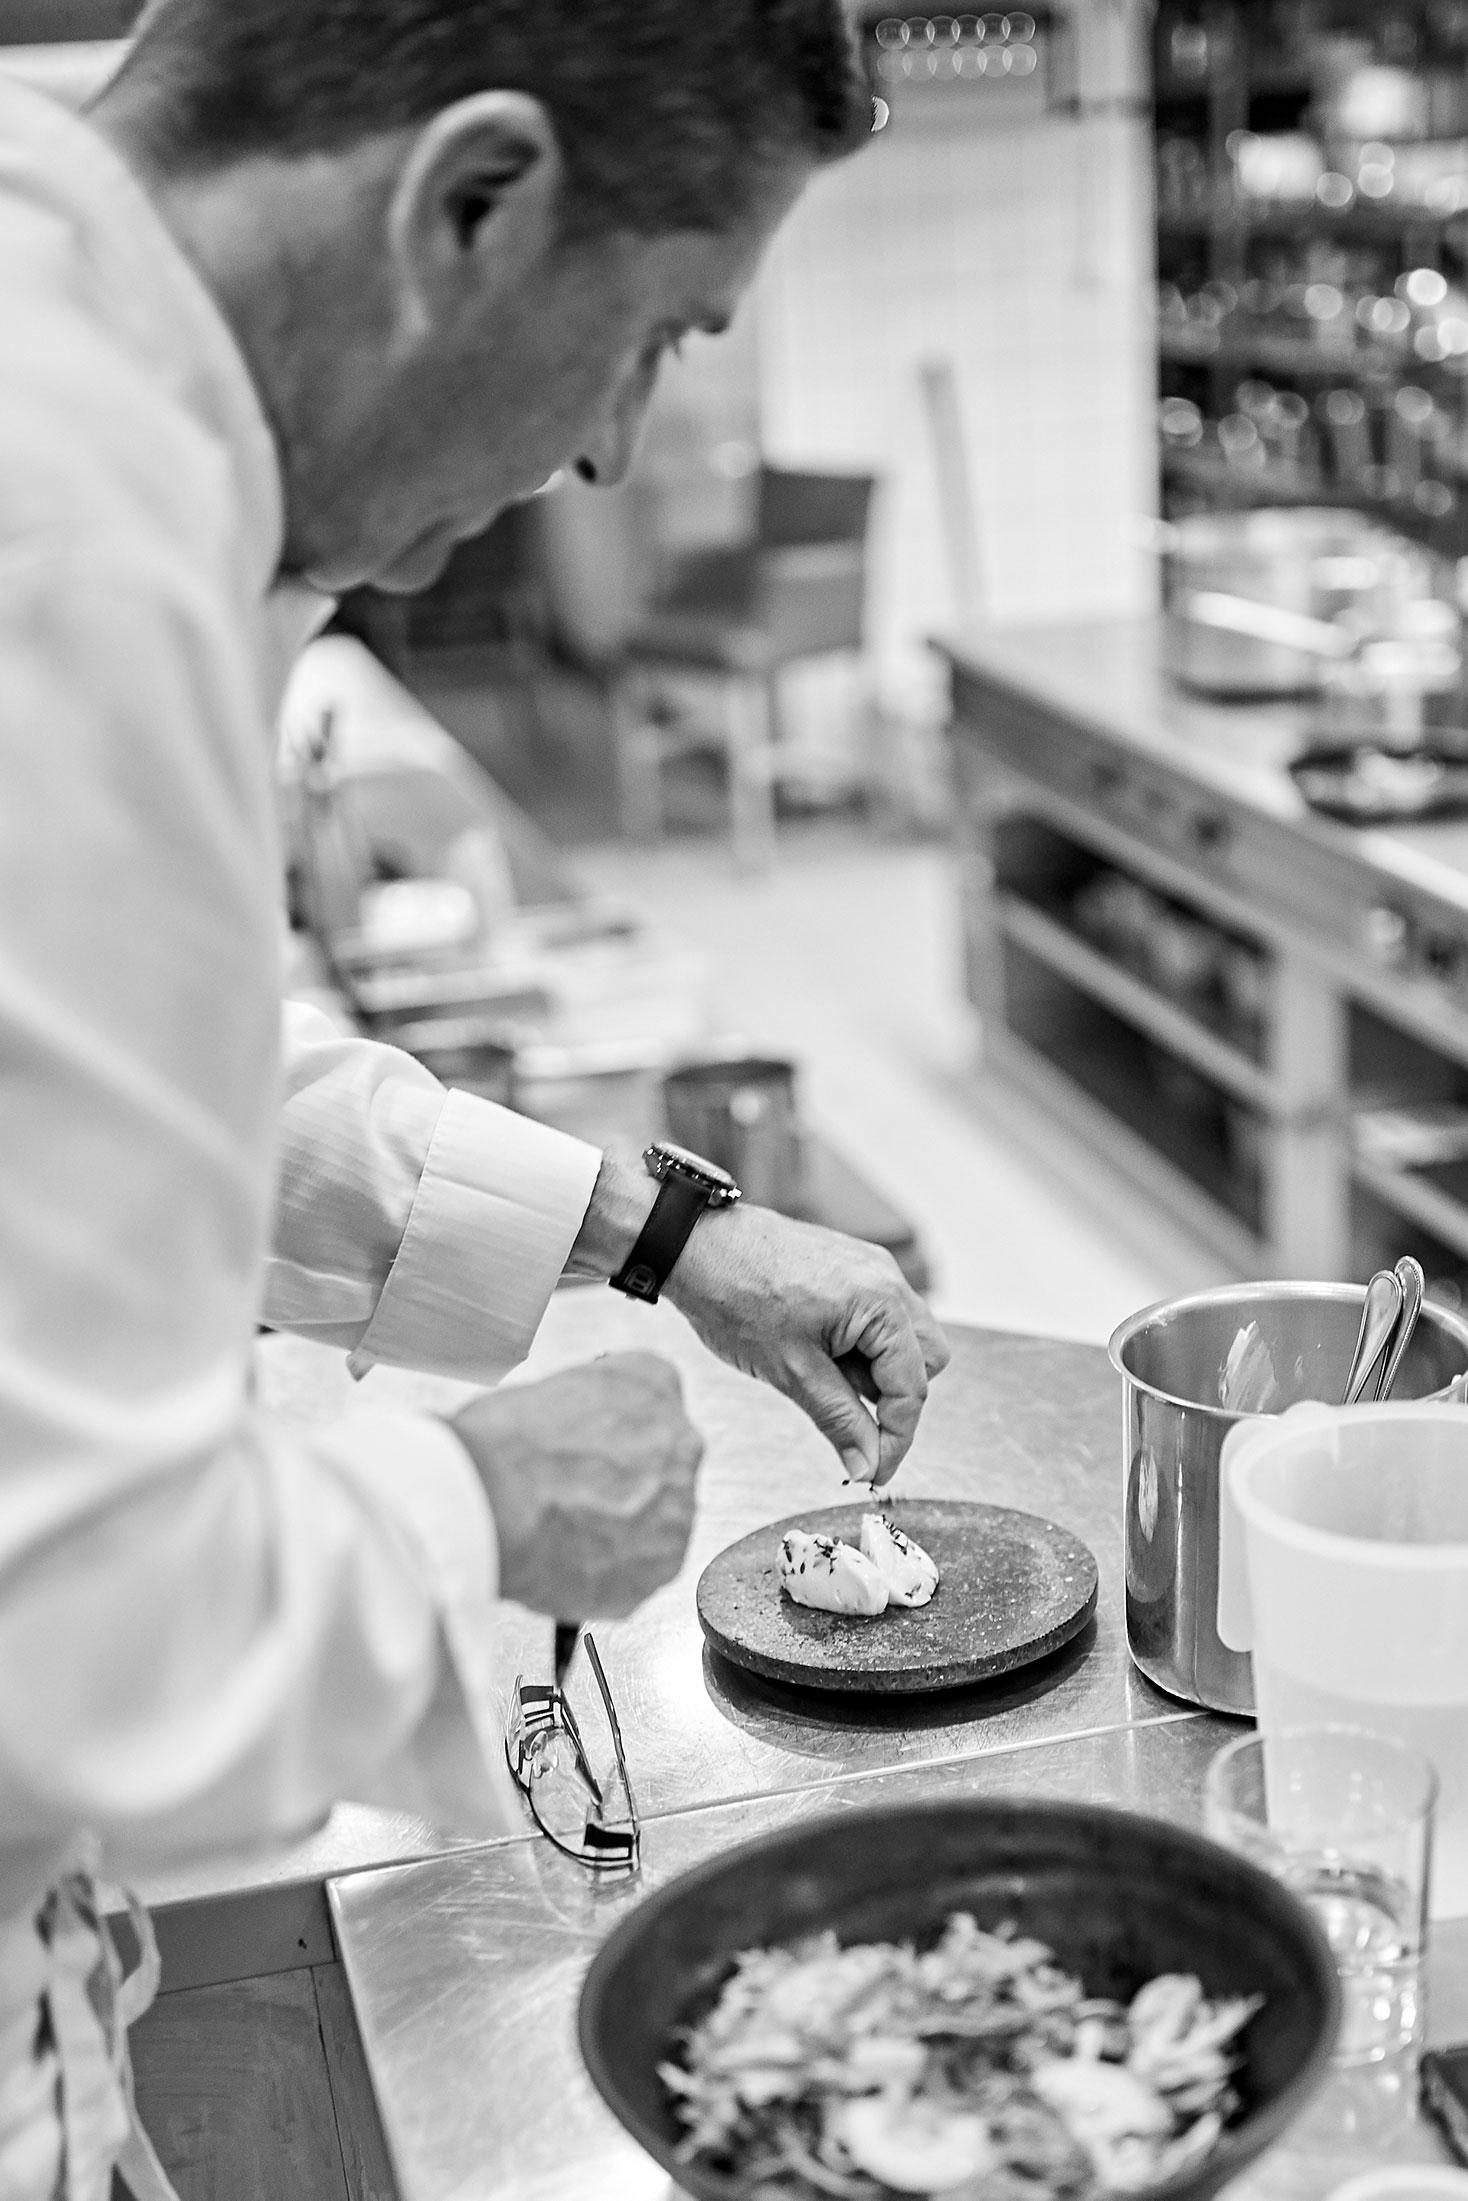 Inside chef Dominique Gauthier's kitchen